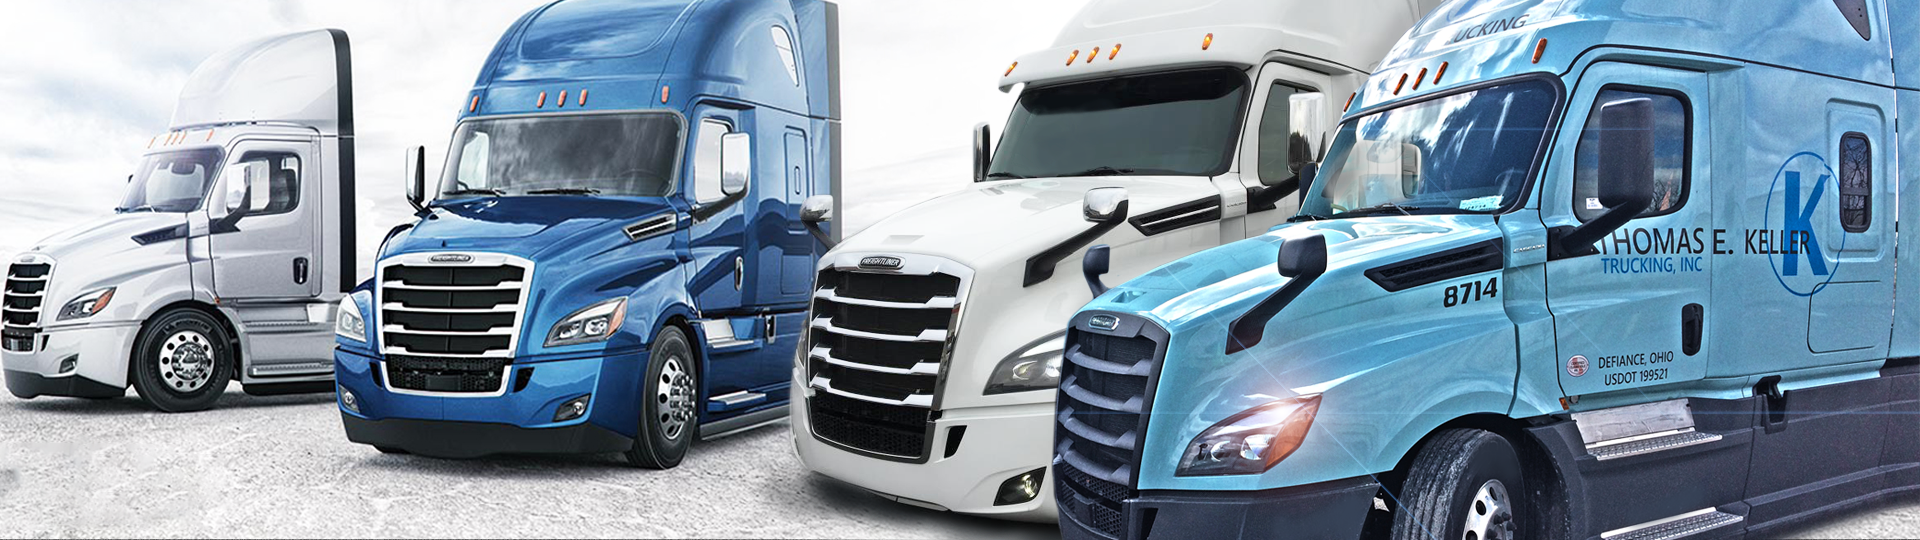 Keller Freight Solutions Hero Image - new website